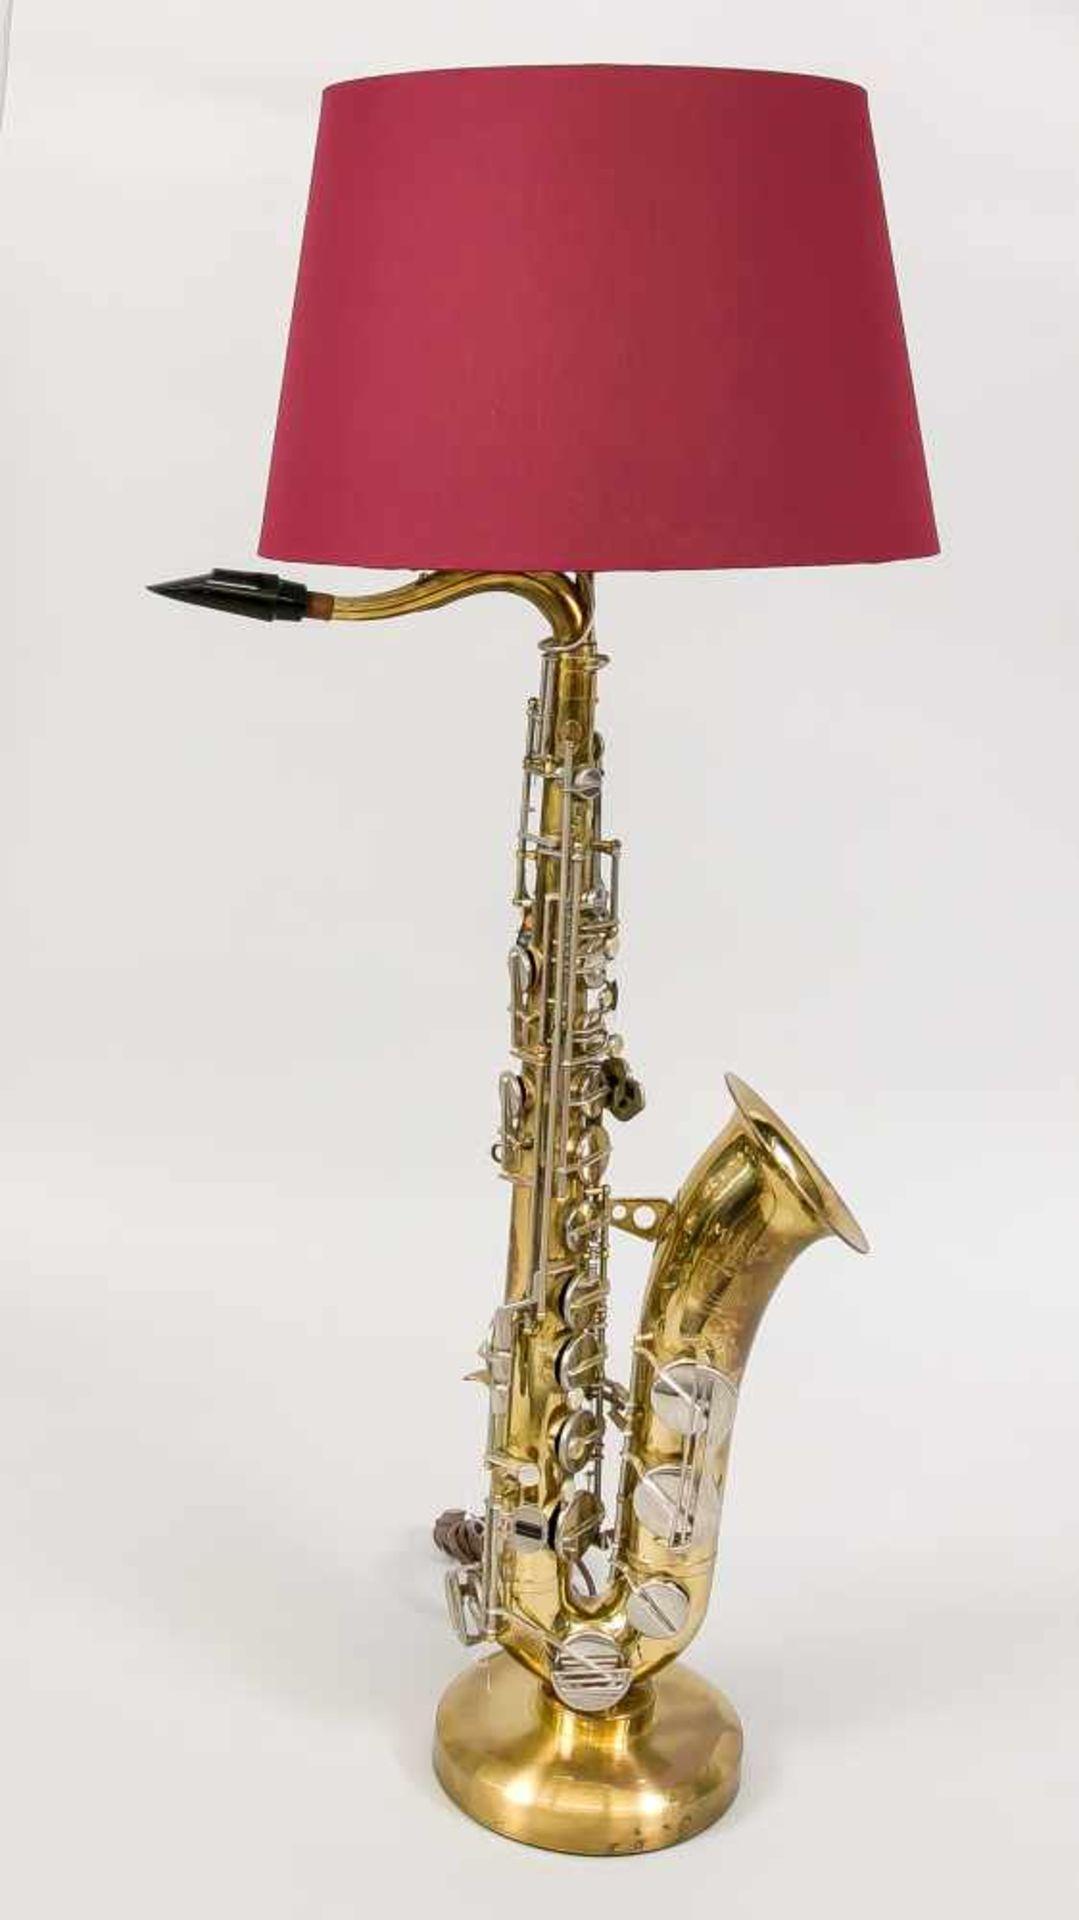 Tenorsaxophon-Lampe, 20. Jh. (Mariage). Runder Messingsockel, darauf stehend ein Saxophon